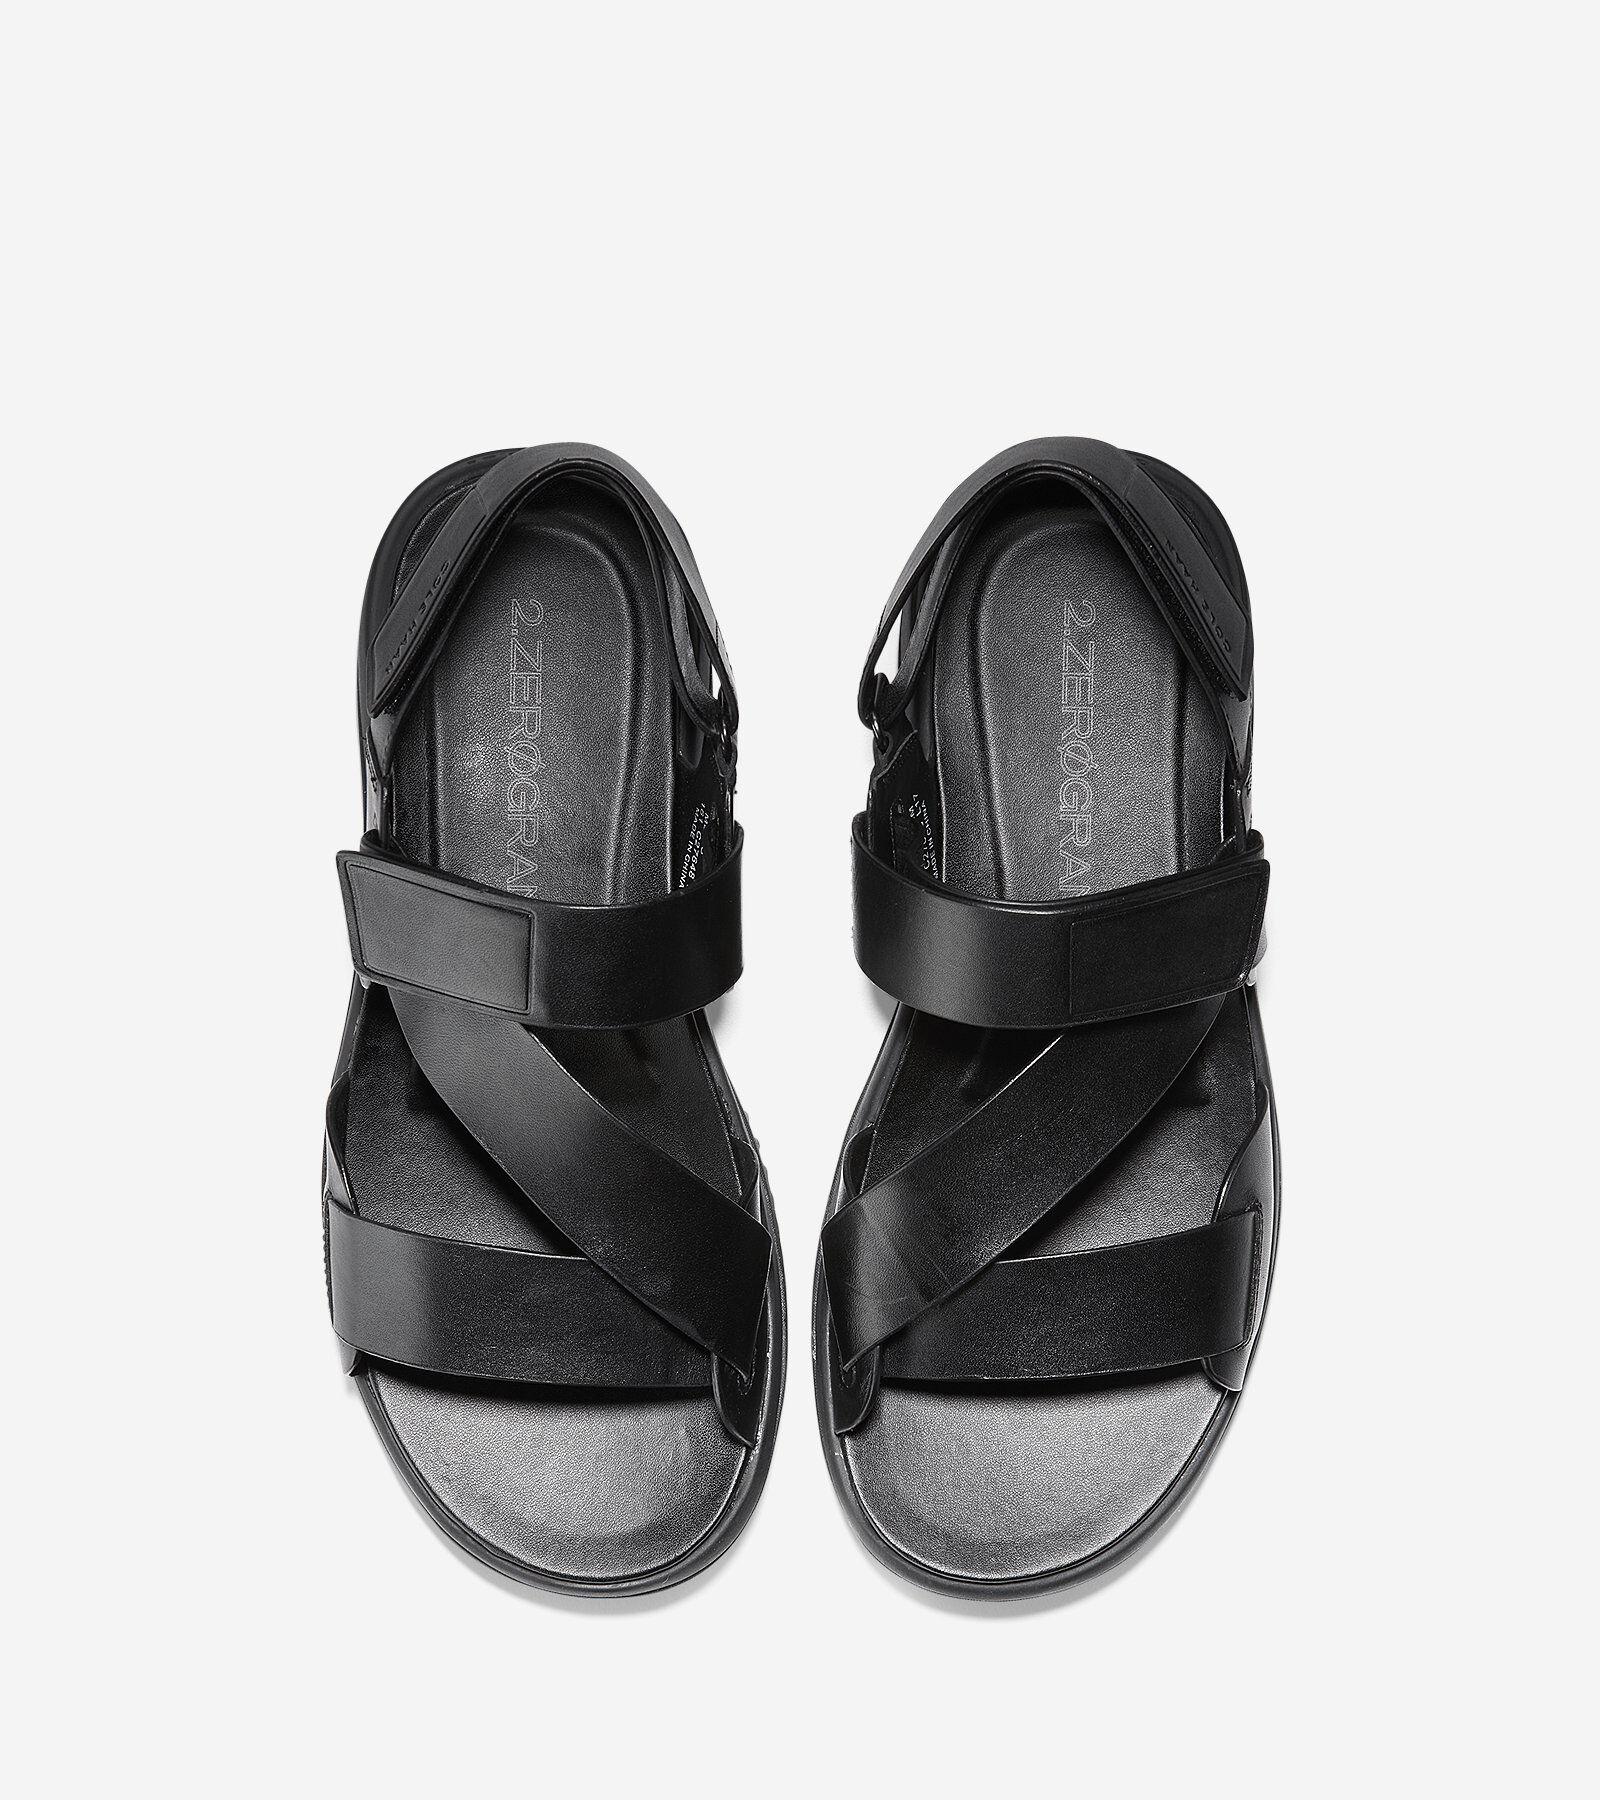 Cole Haan ZeroGrand 2-Strap Sandal CgASfS